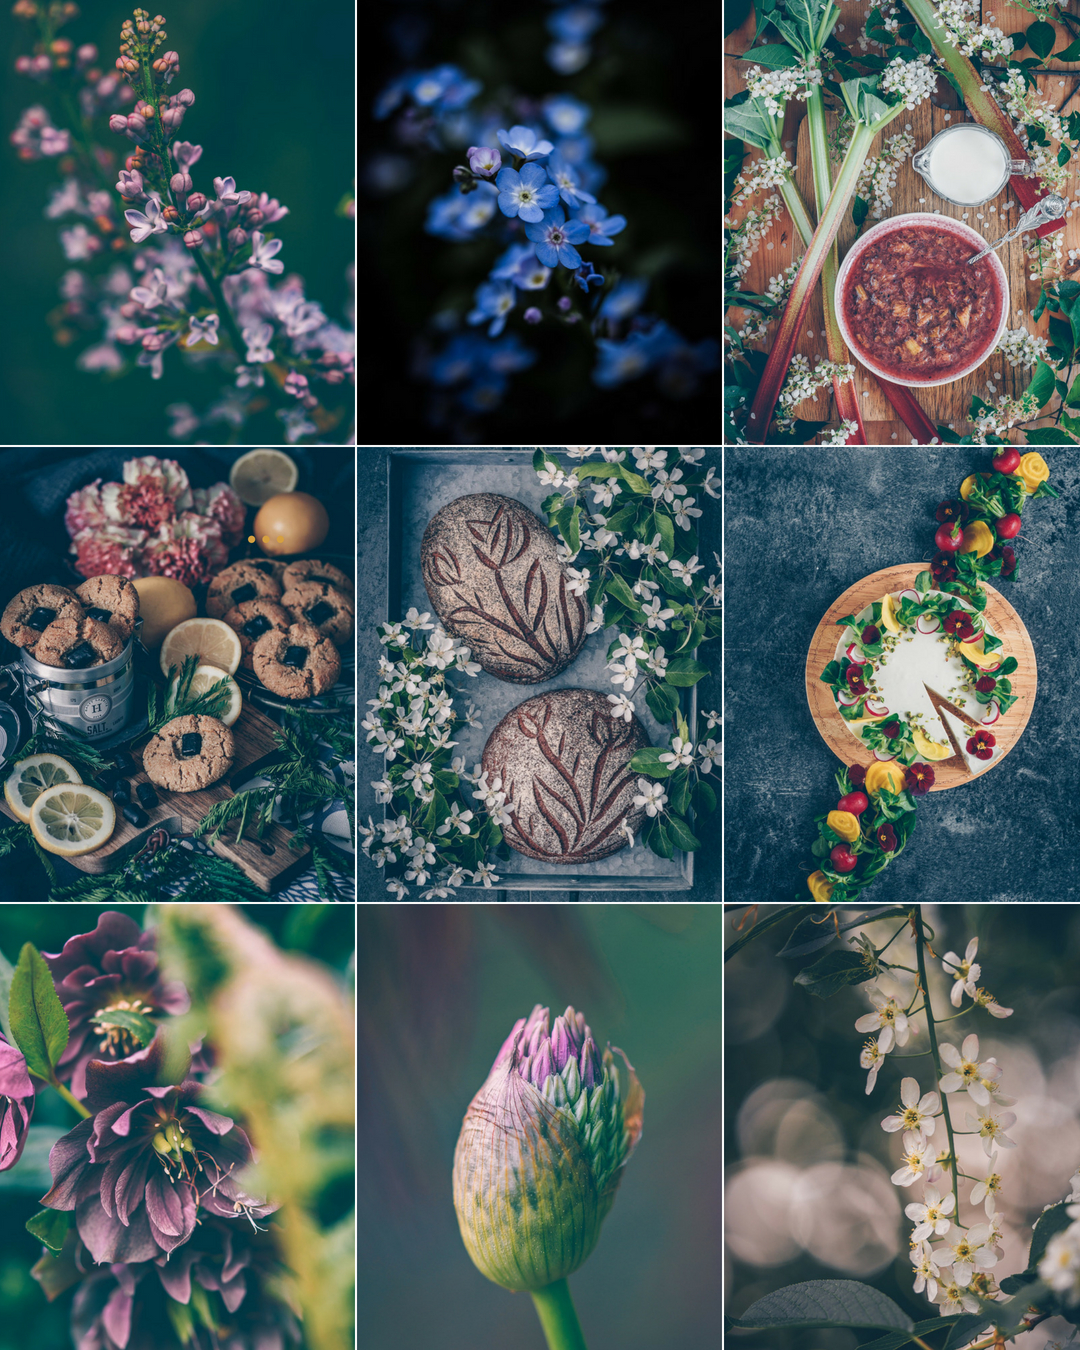 maj collage instagram